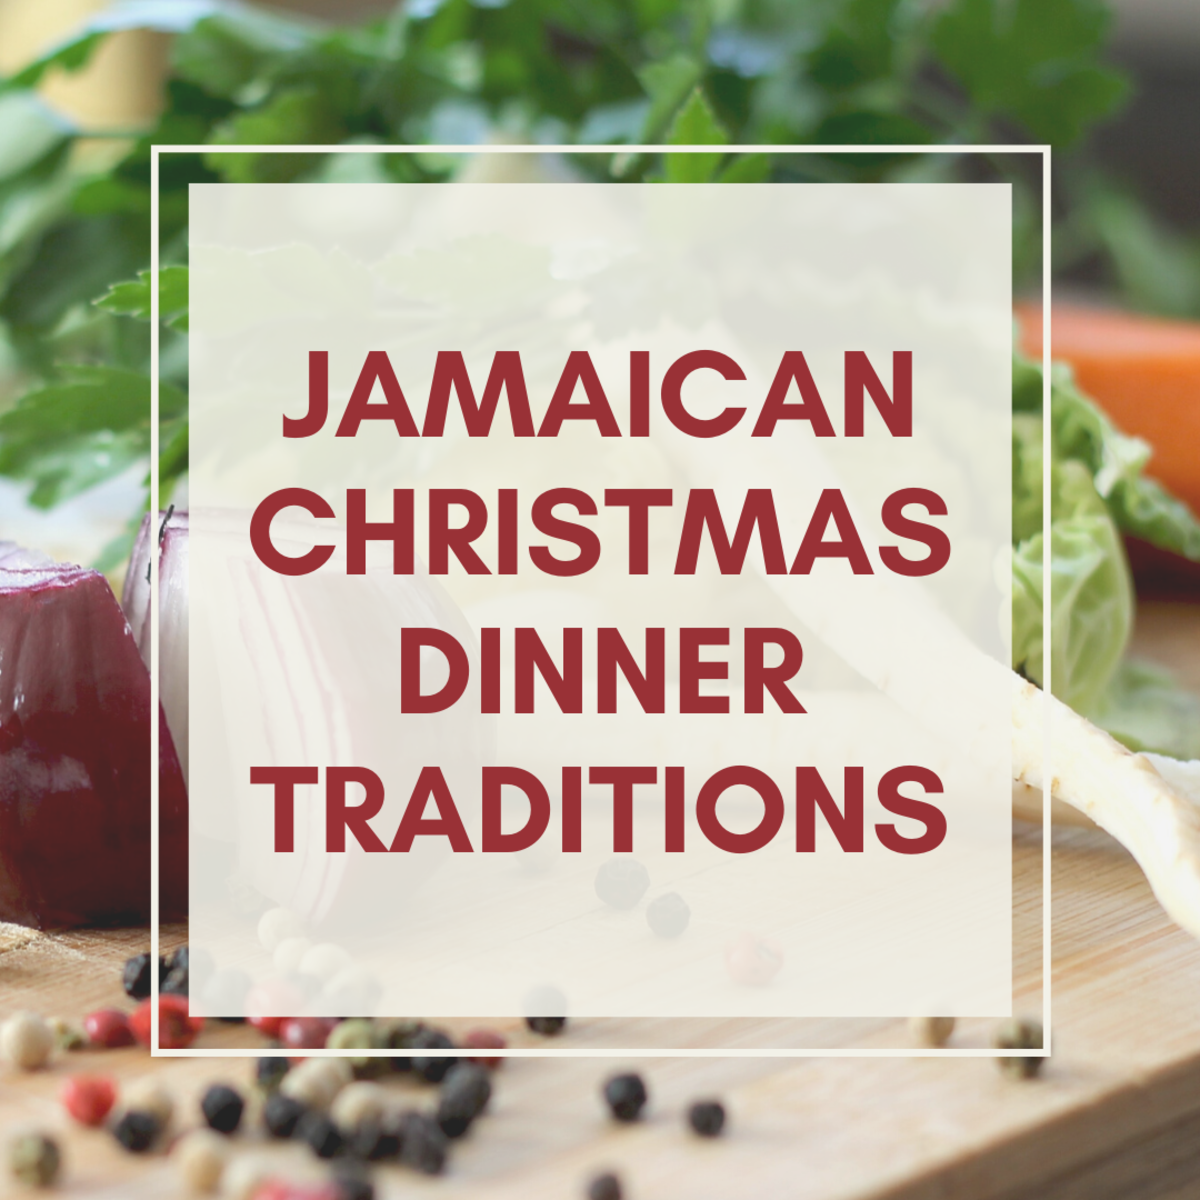 Jamaican Christmas Dinner Menu Ideas